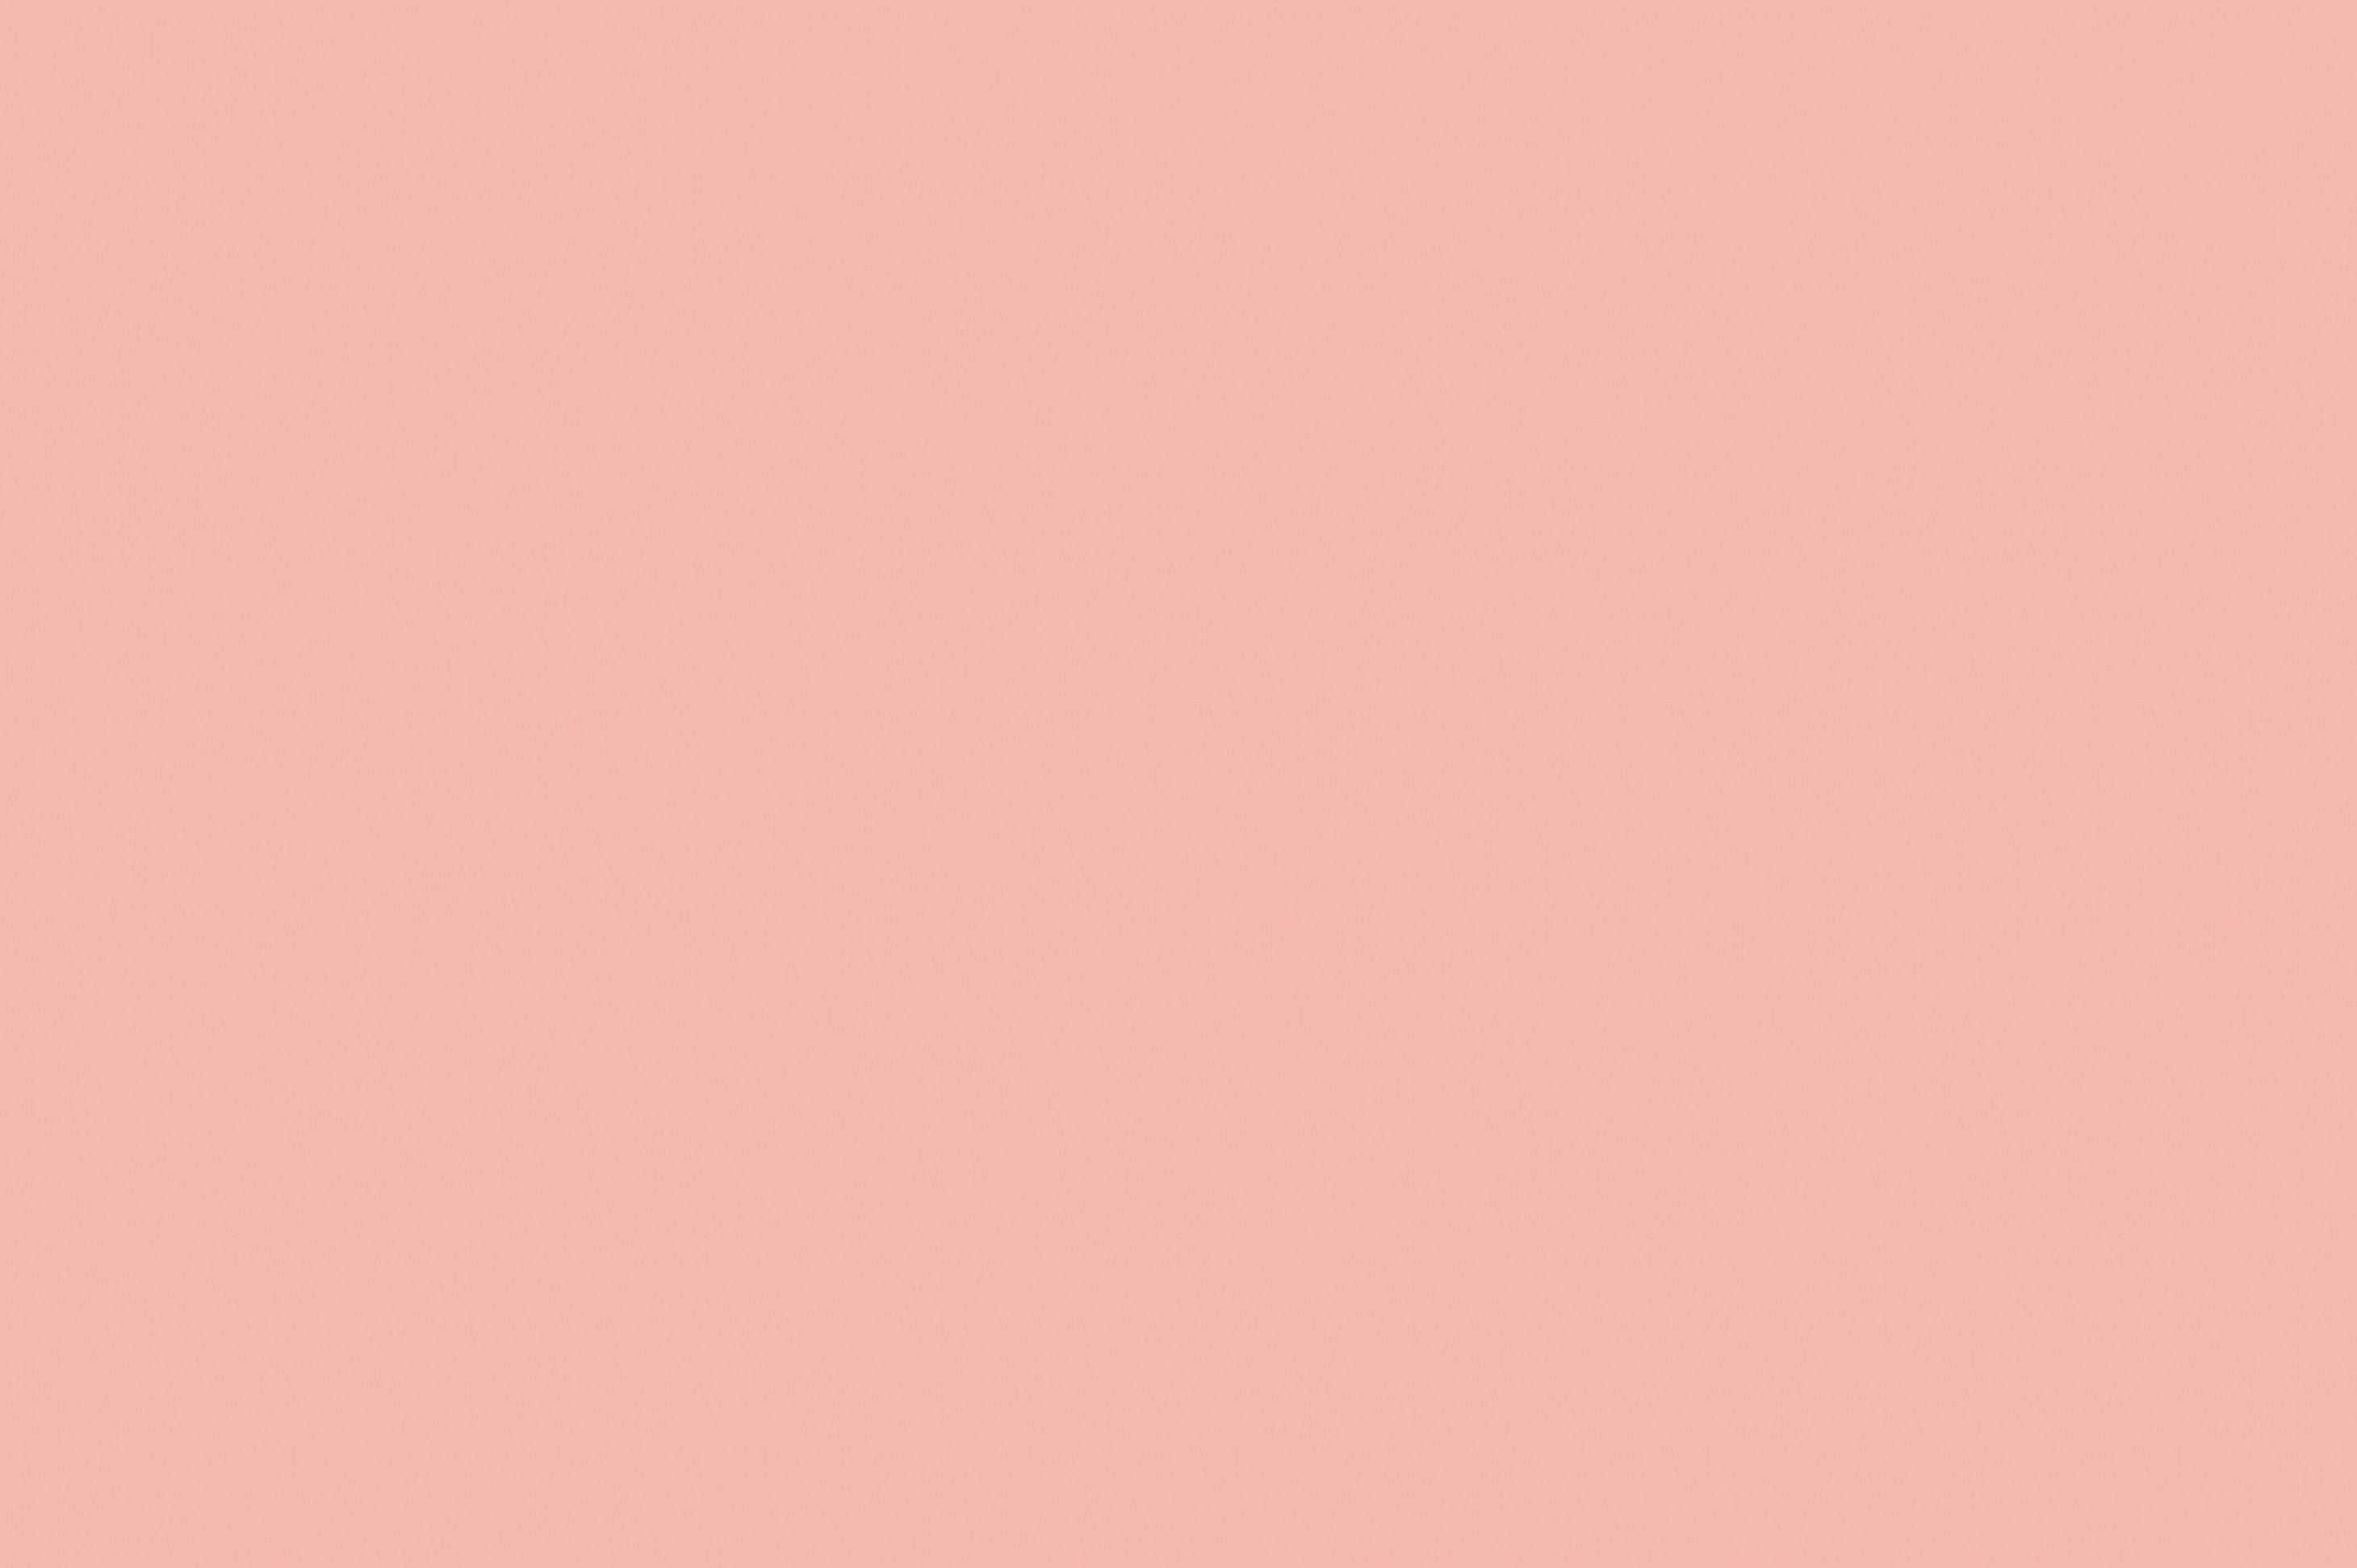 Plain pink wallpaper wallpapersafari - Pastel pink wallpaper hd ...